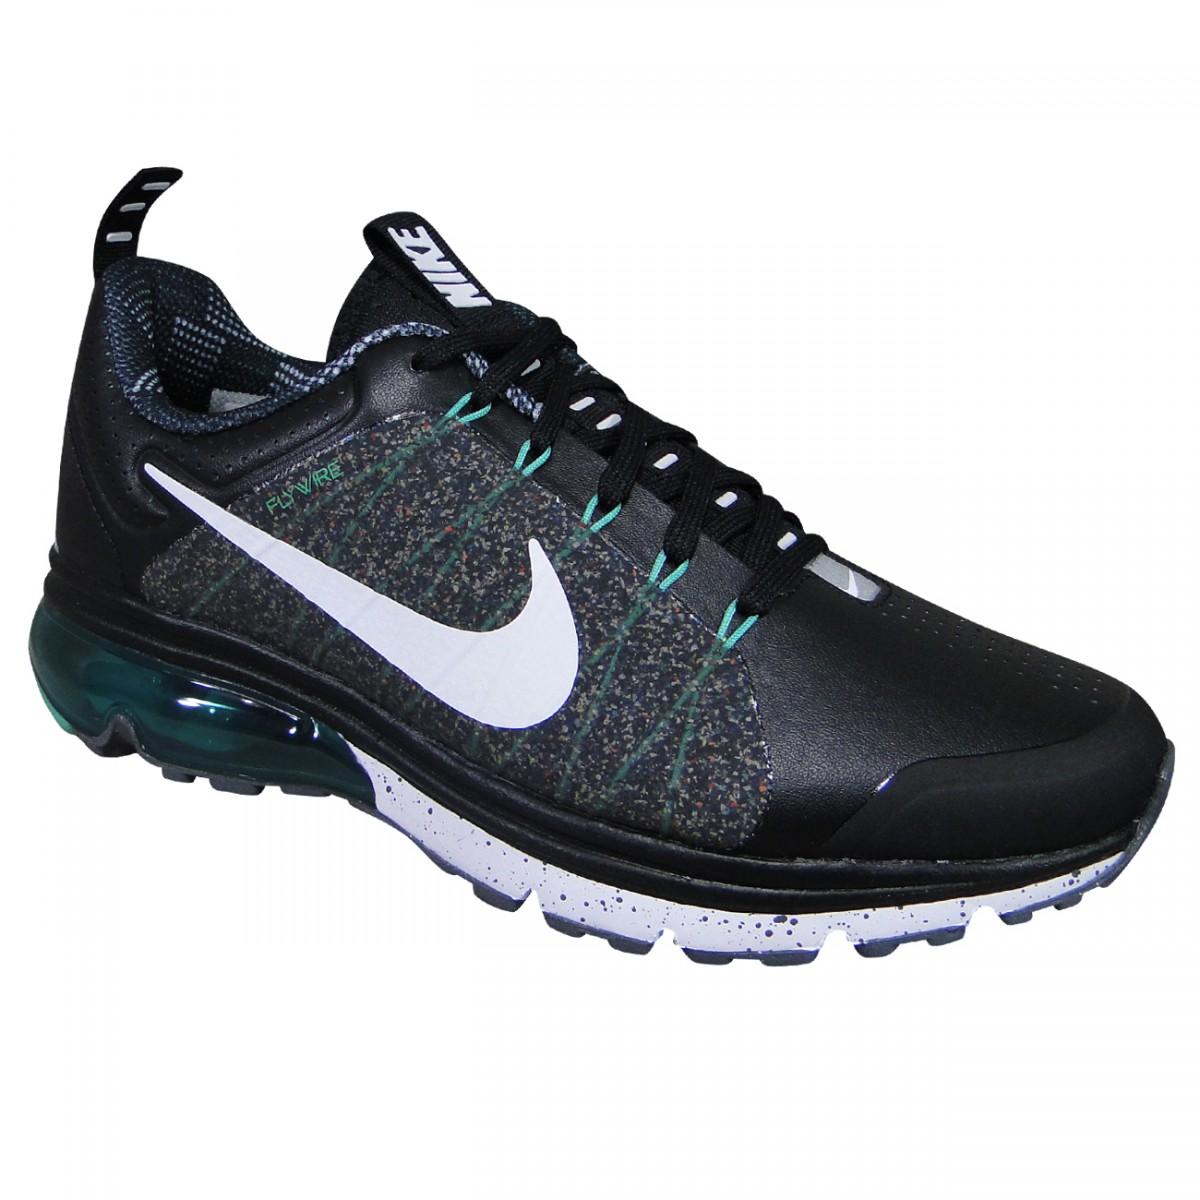 separation shoes dcd3b ec396 Tenis Nike Air Max Supreme 4 806868 031 - PretoBrancoVerde - Chuteira Nike,  Adidas. Sandalias Femininas. Sandy Calçados